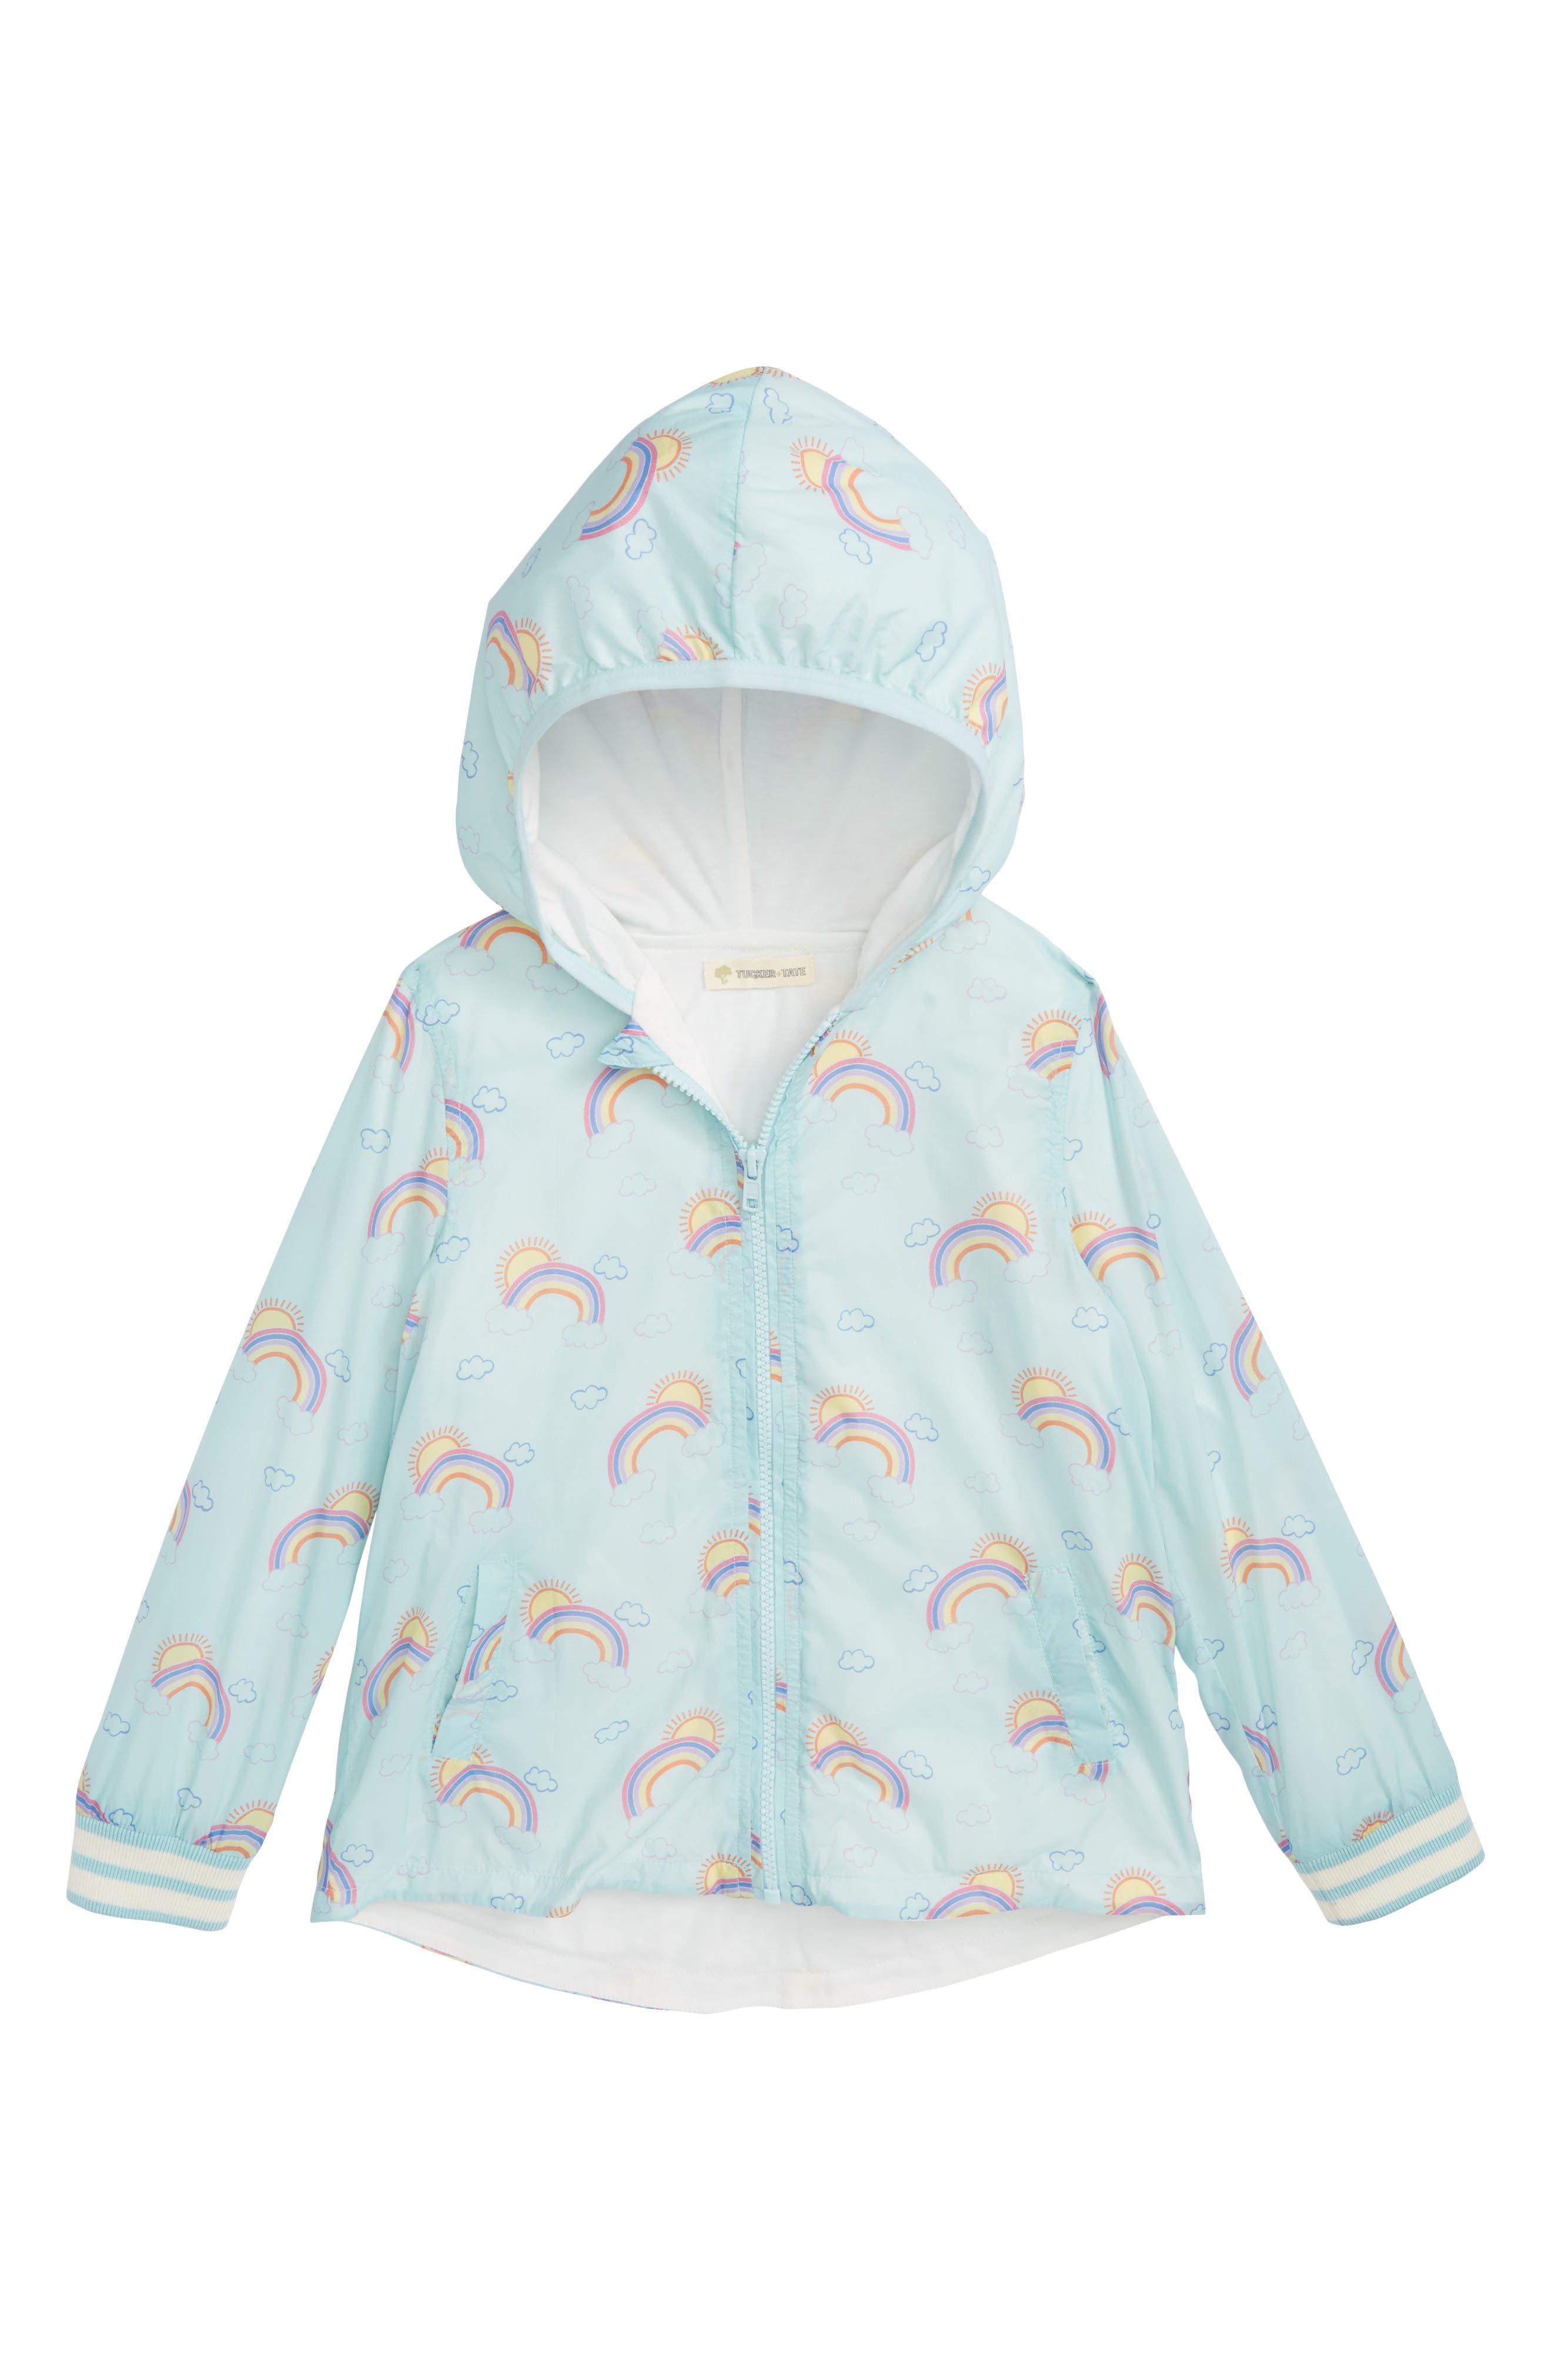 Alternate Image 1 Selected - Tucker + Tate Rainbow Print Hooded Jacket (Toddler Girls, Little Girls & Big Girls)